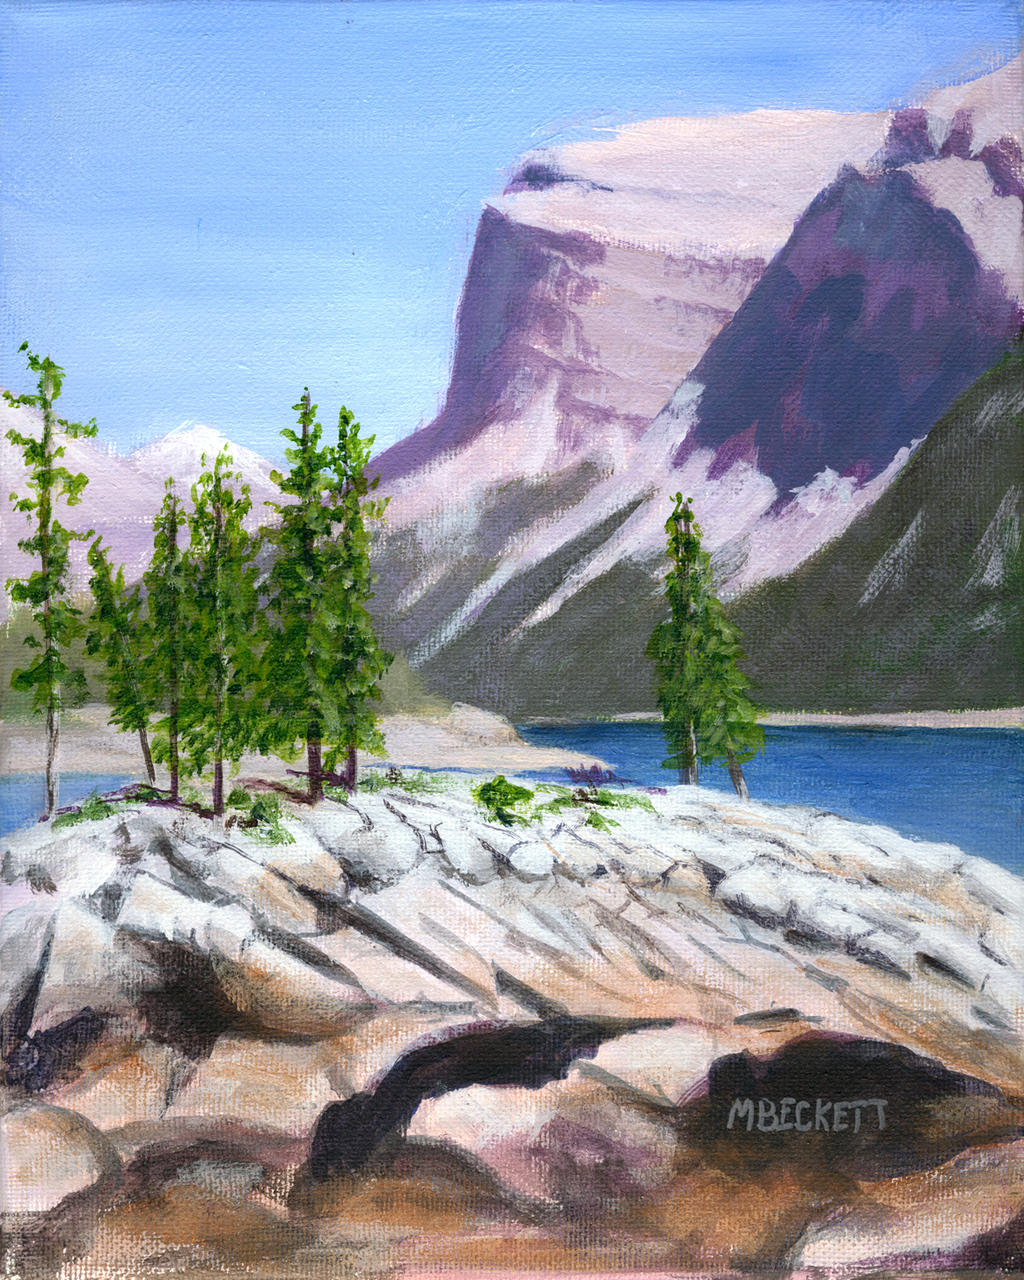 Lake Minnewanka by spudsy2